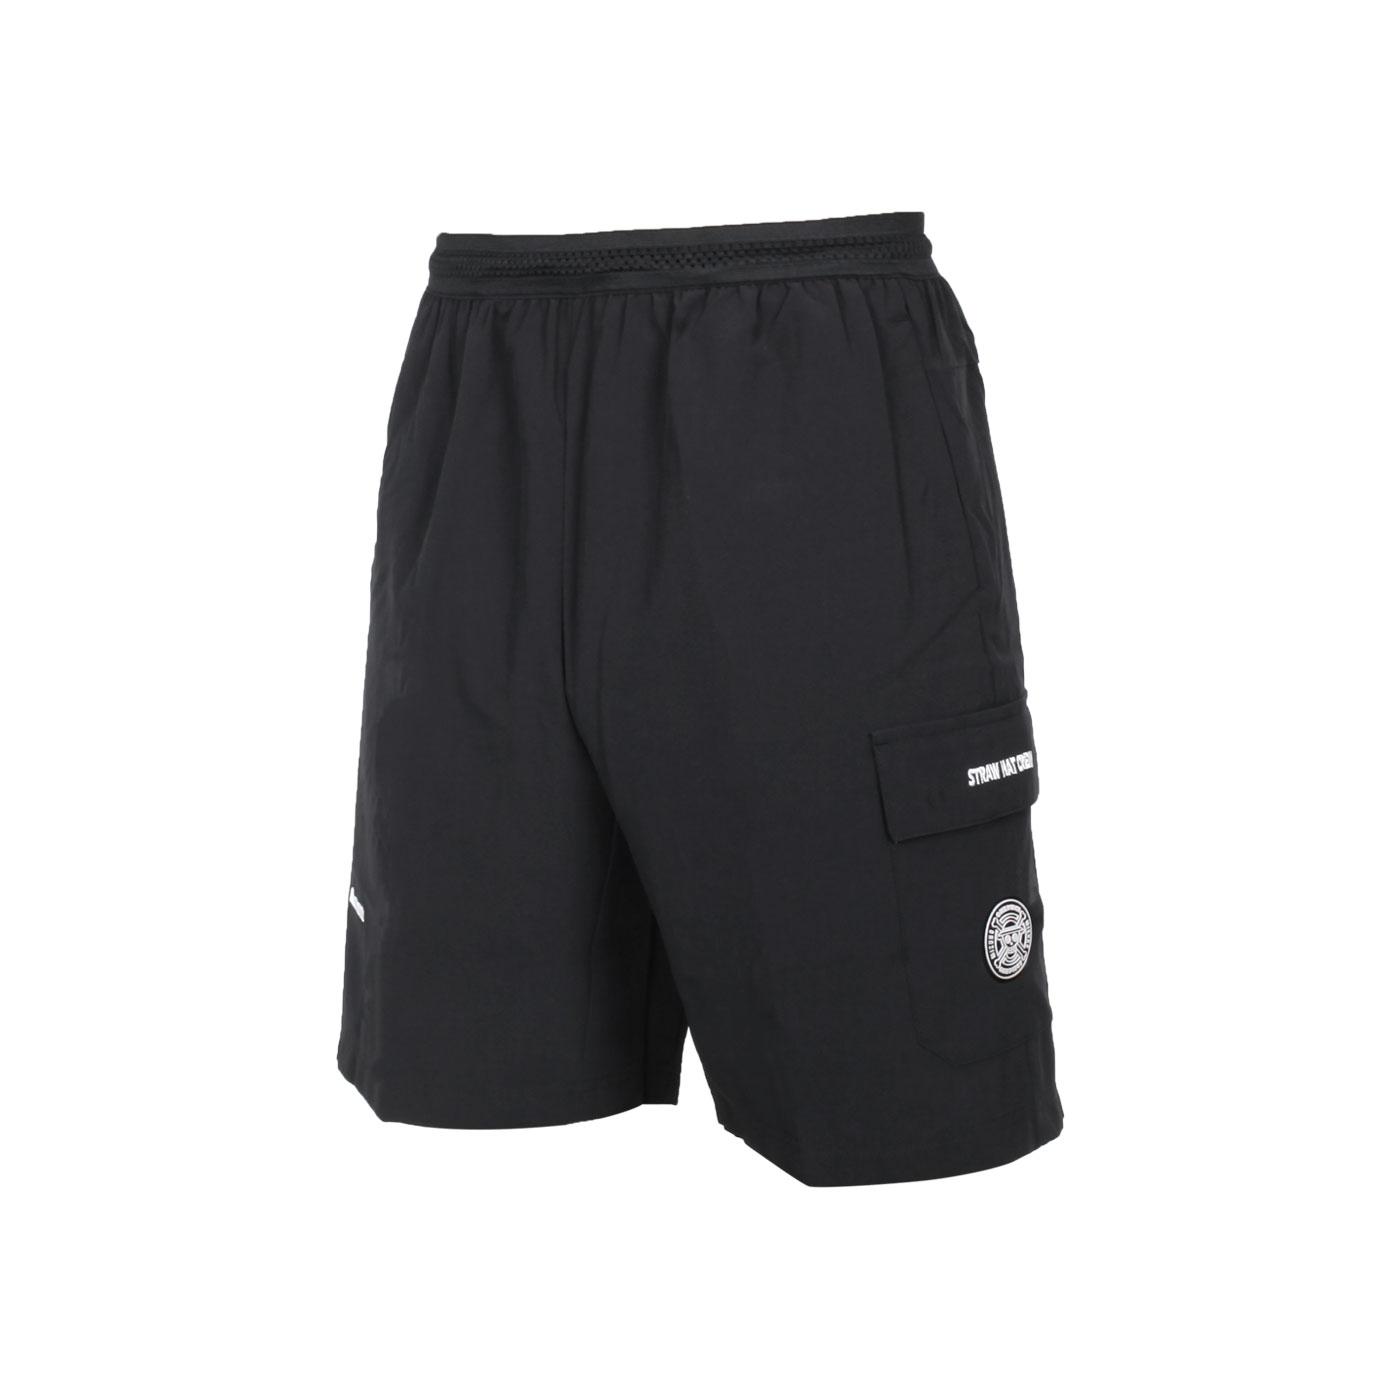 MIZUNO 男平織短褲(海賊王聯名款) D2TB155709 - 黑白